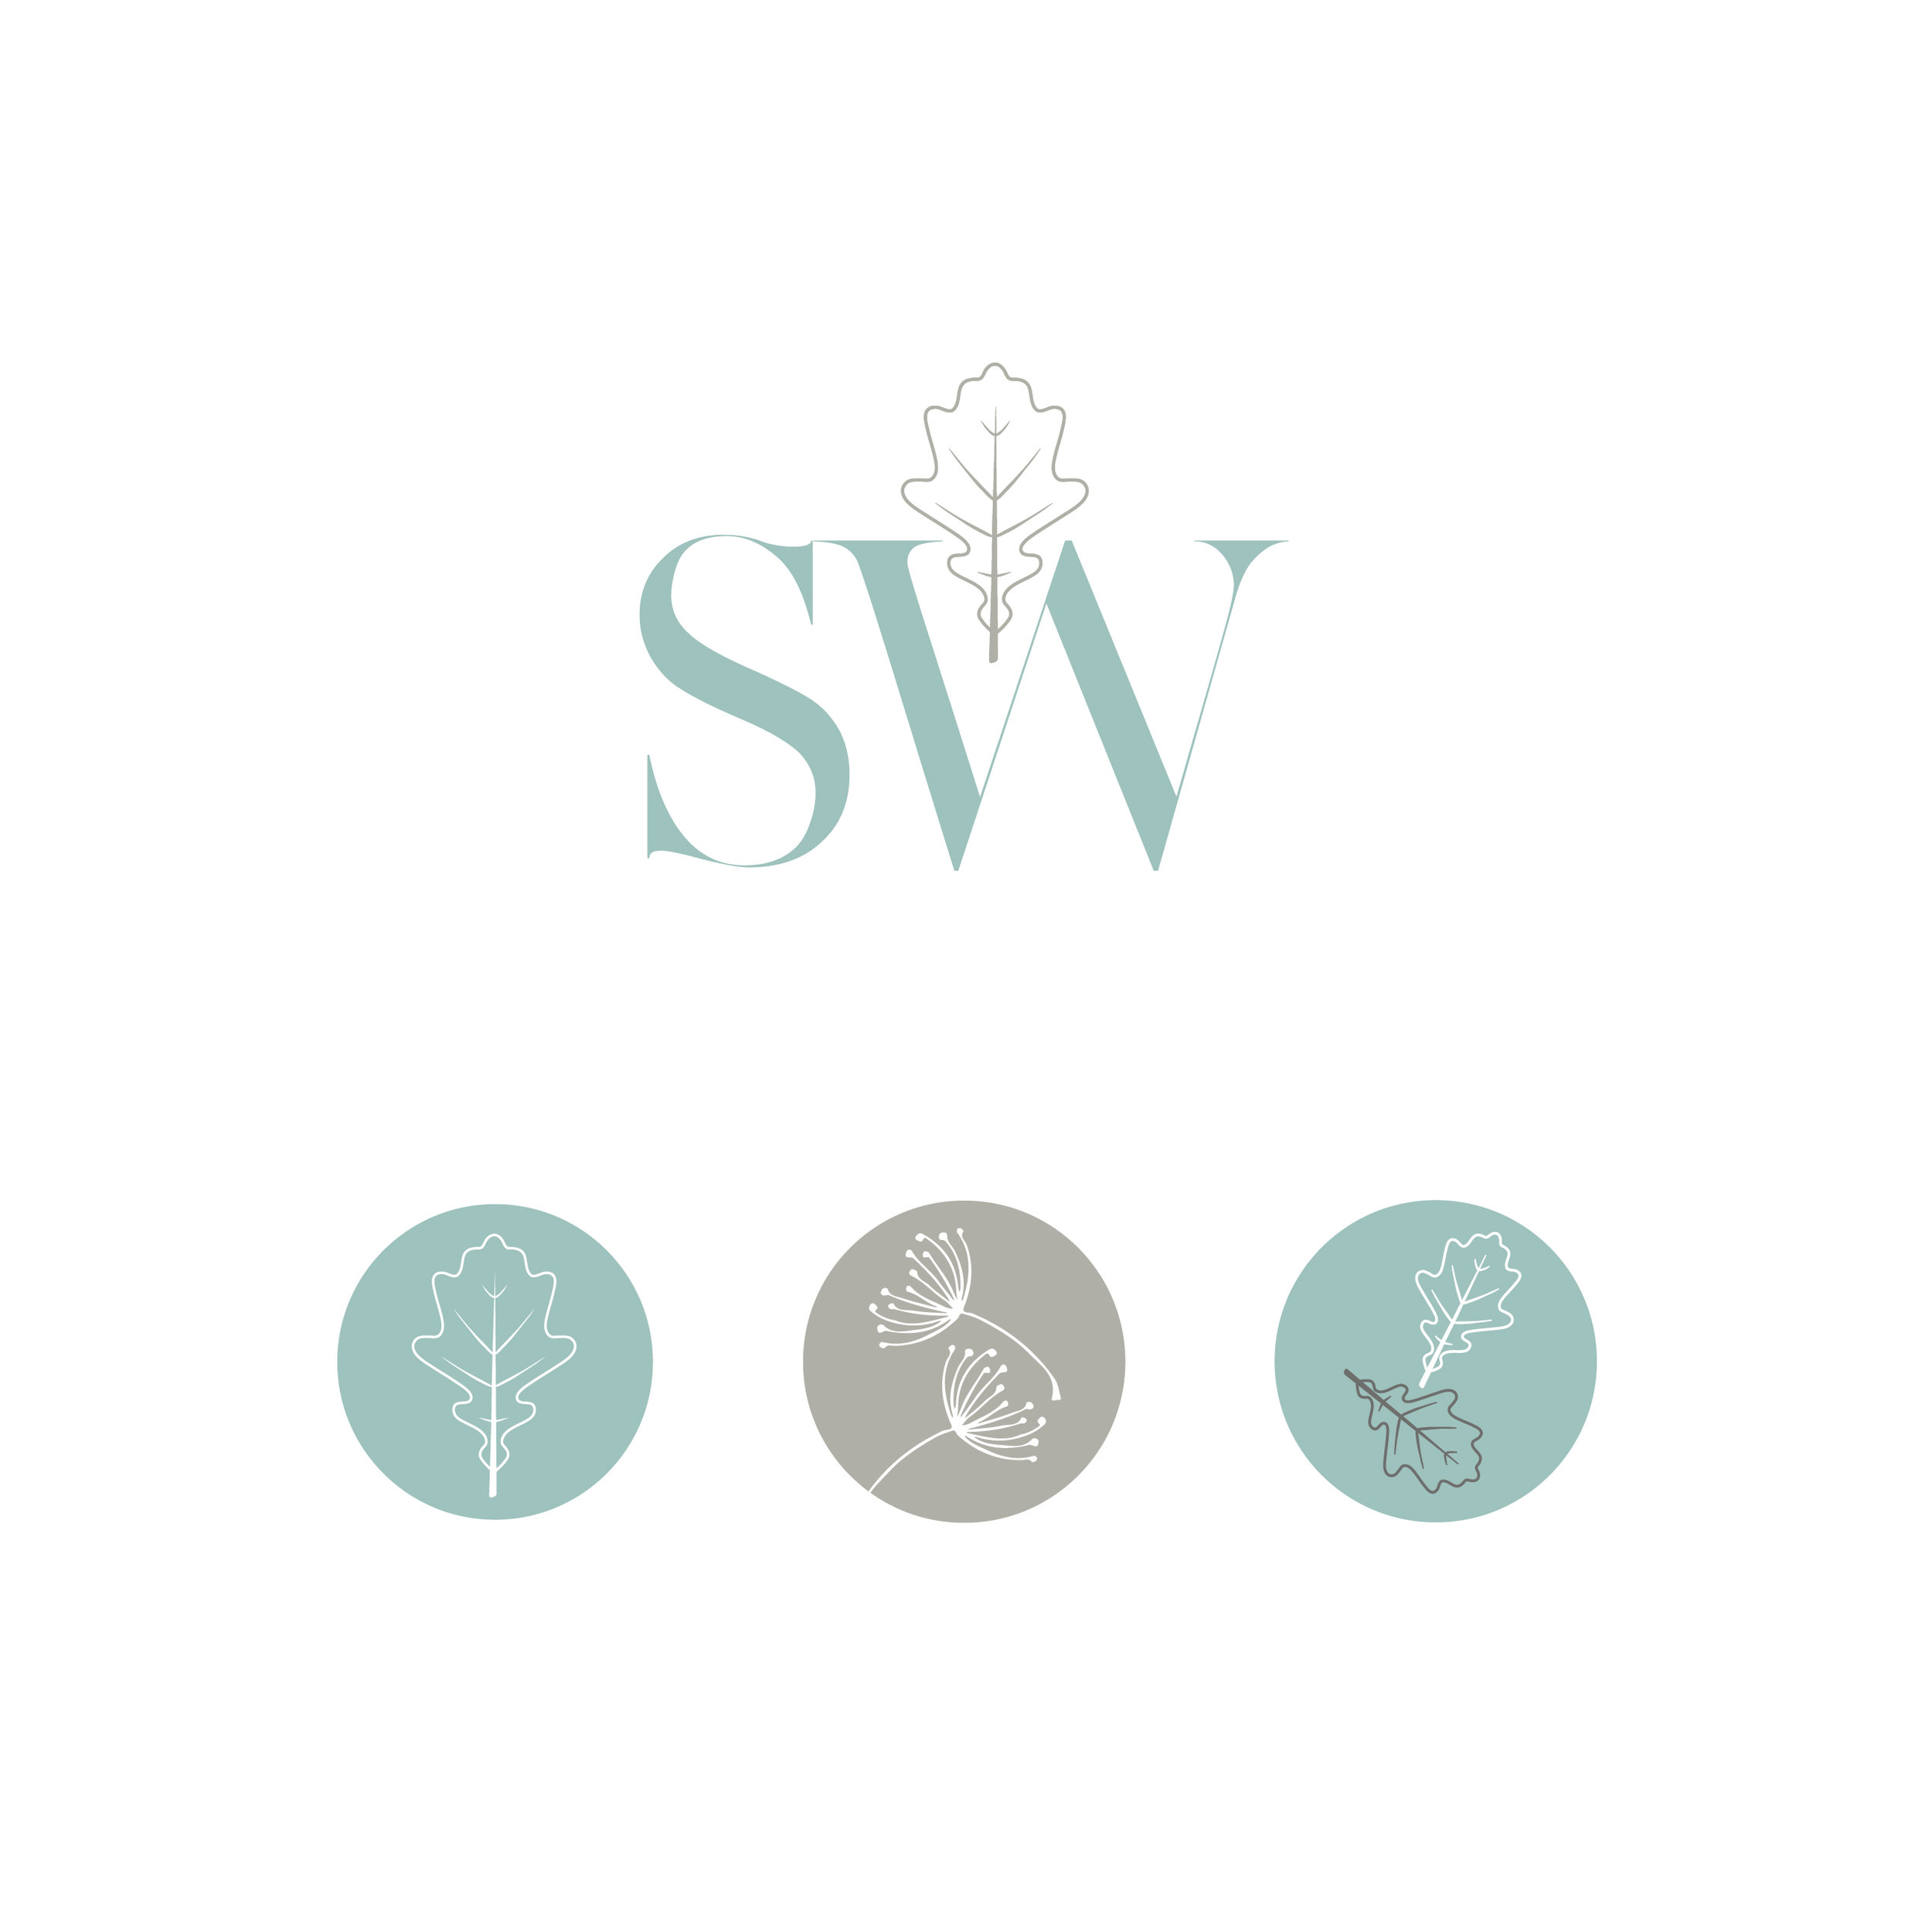 SWP_final_brand_insta-04.jpg